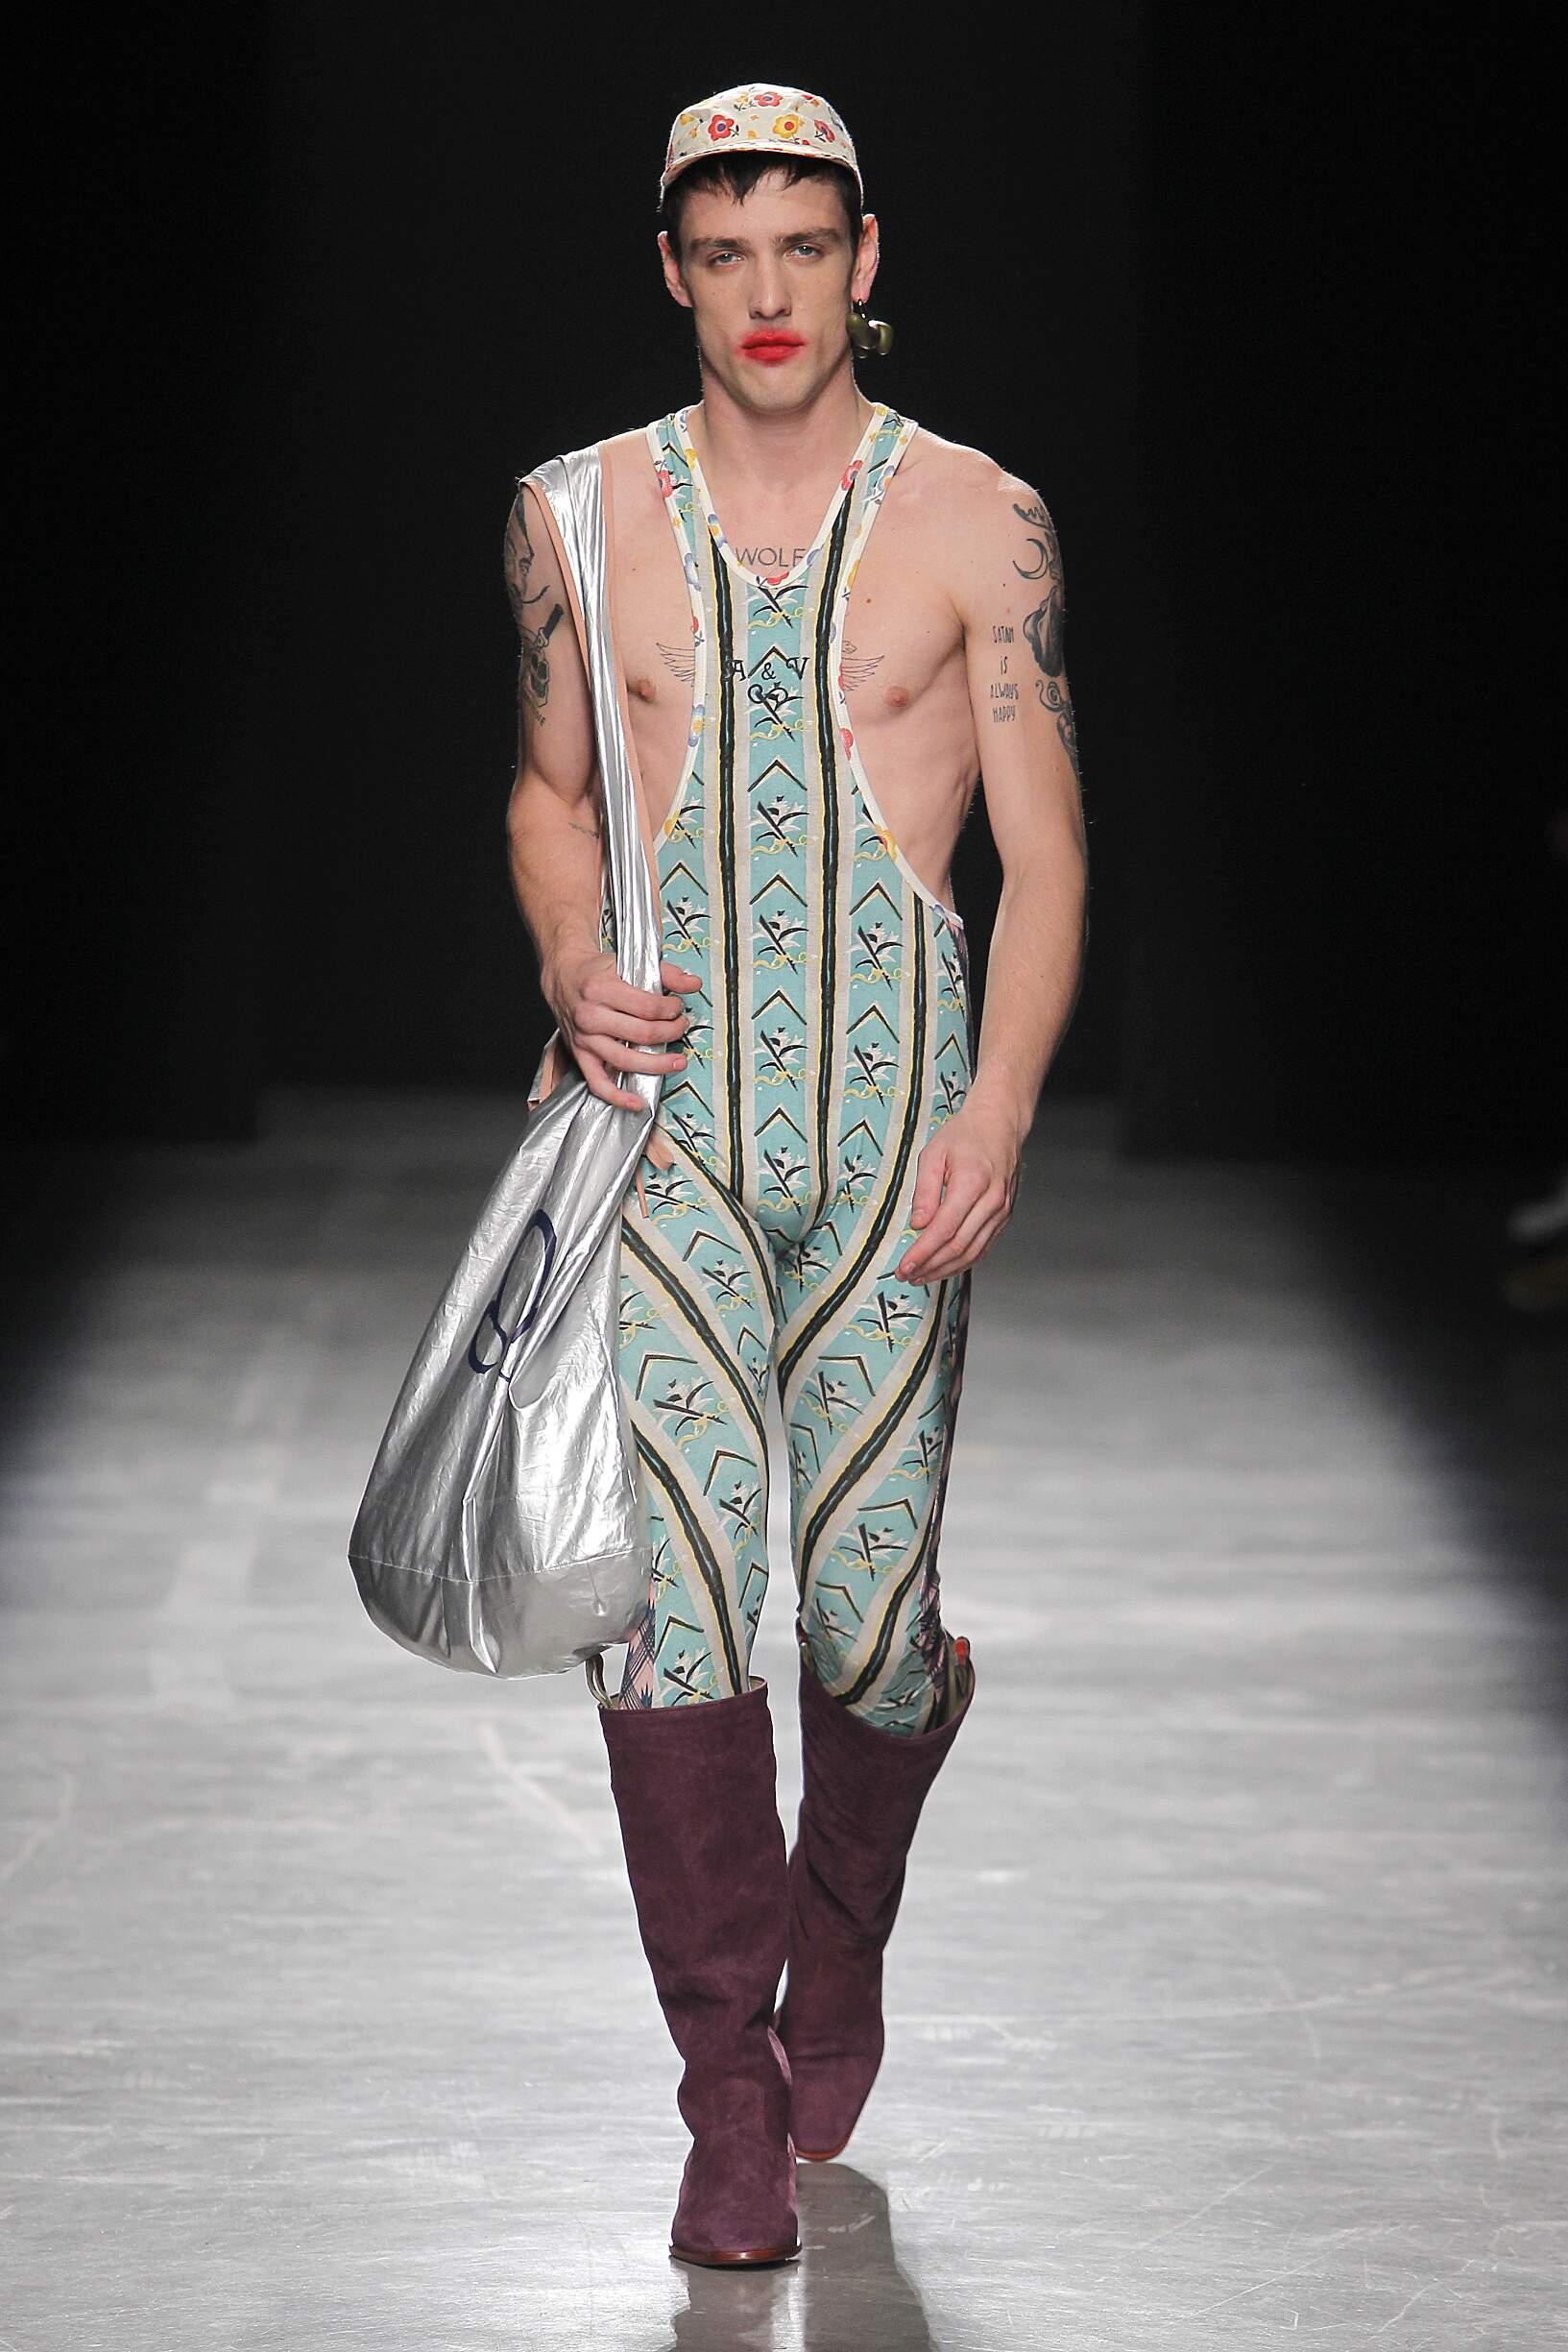 2017 Catwalk Andreas Kronthaler for Vivienne Westwood Man Fashion Show Summer